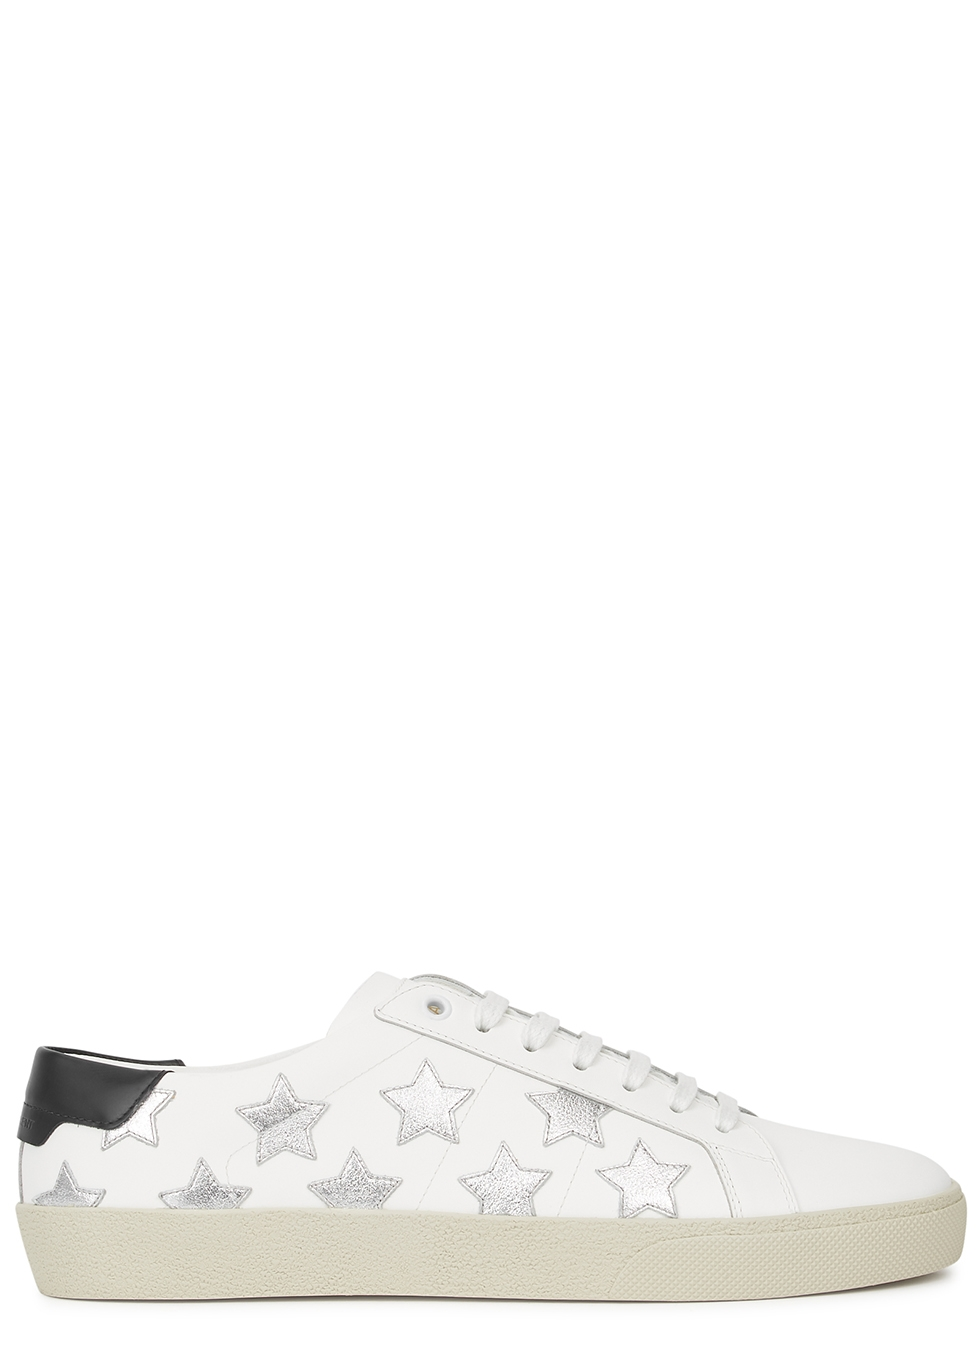 SL/06 white star-appliquéd leather sneakers